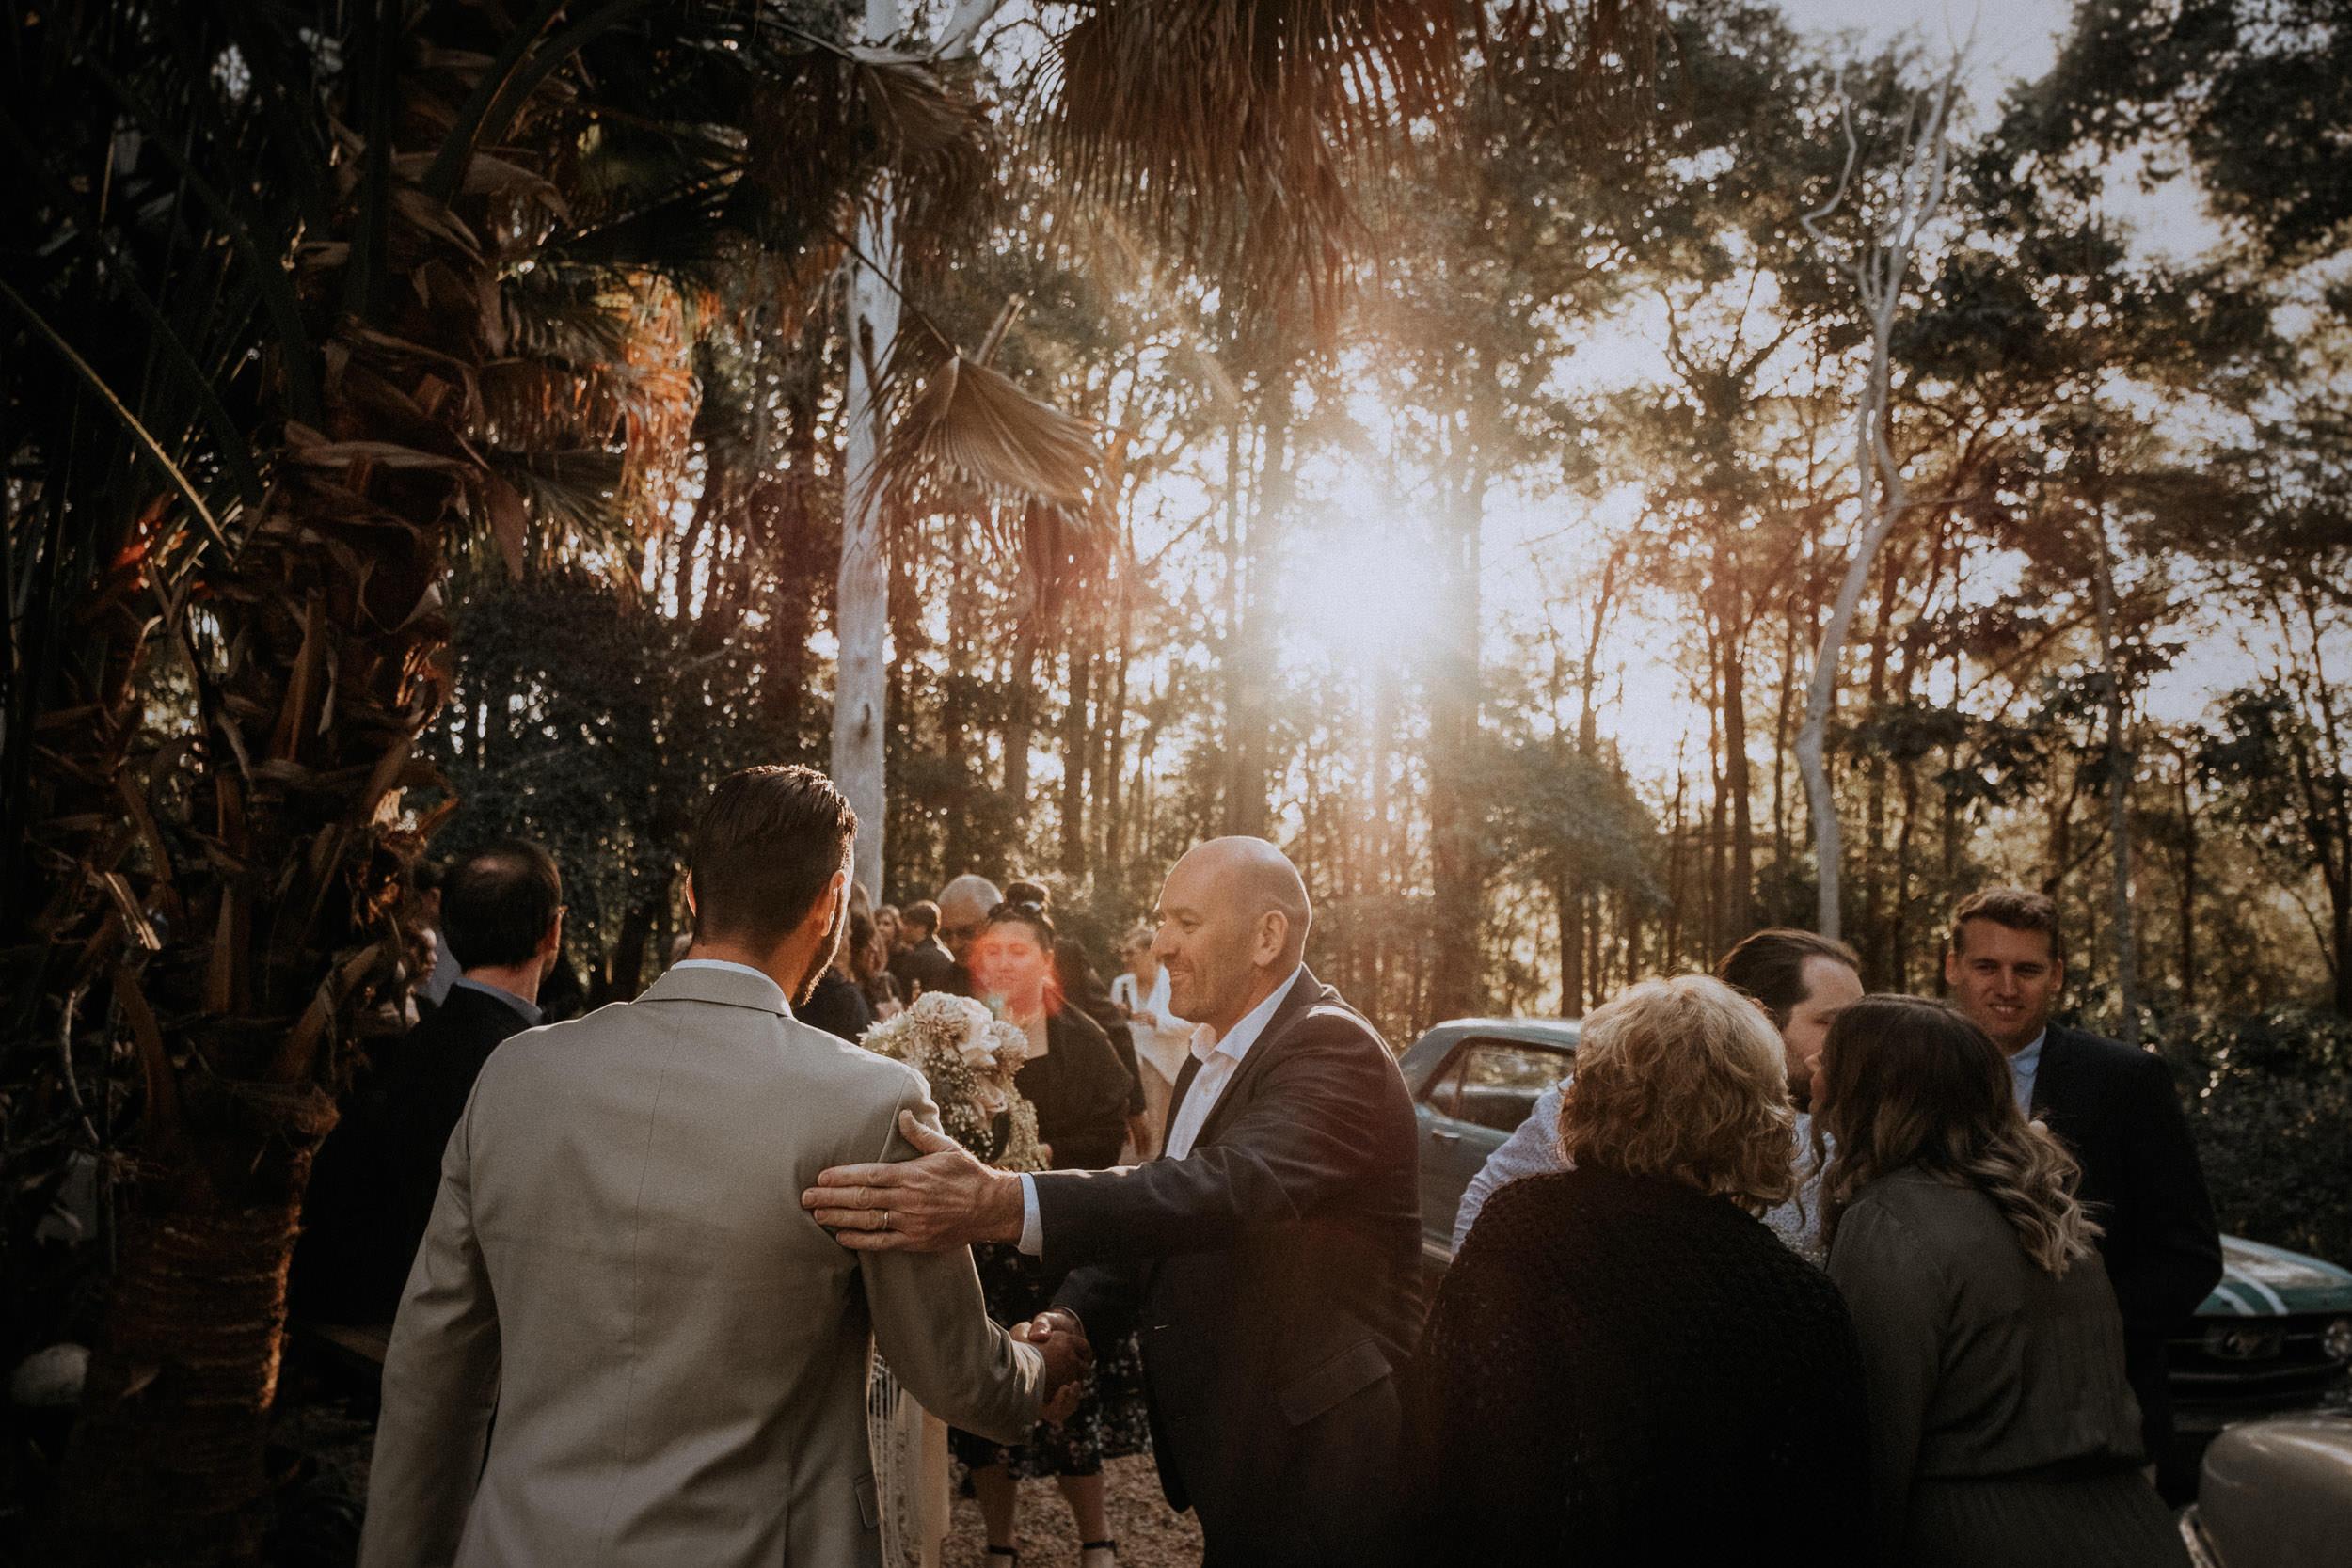 S&A Elopement - Kings & Thieves - Shred 'Til Dead - Central Coast Beach Forest Wedding - 327.jpg